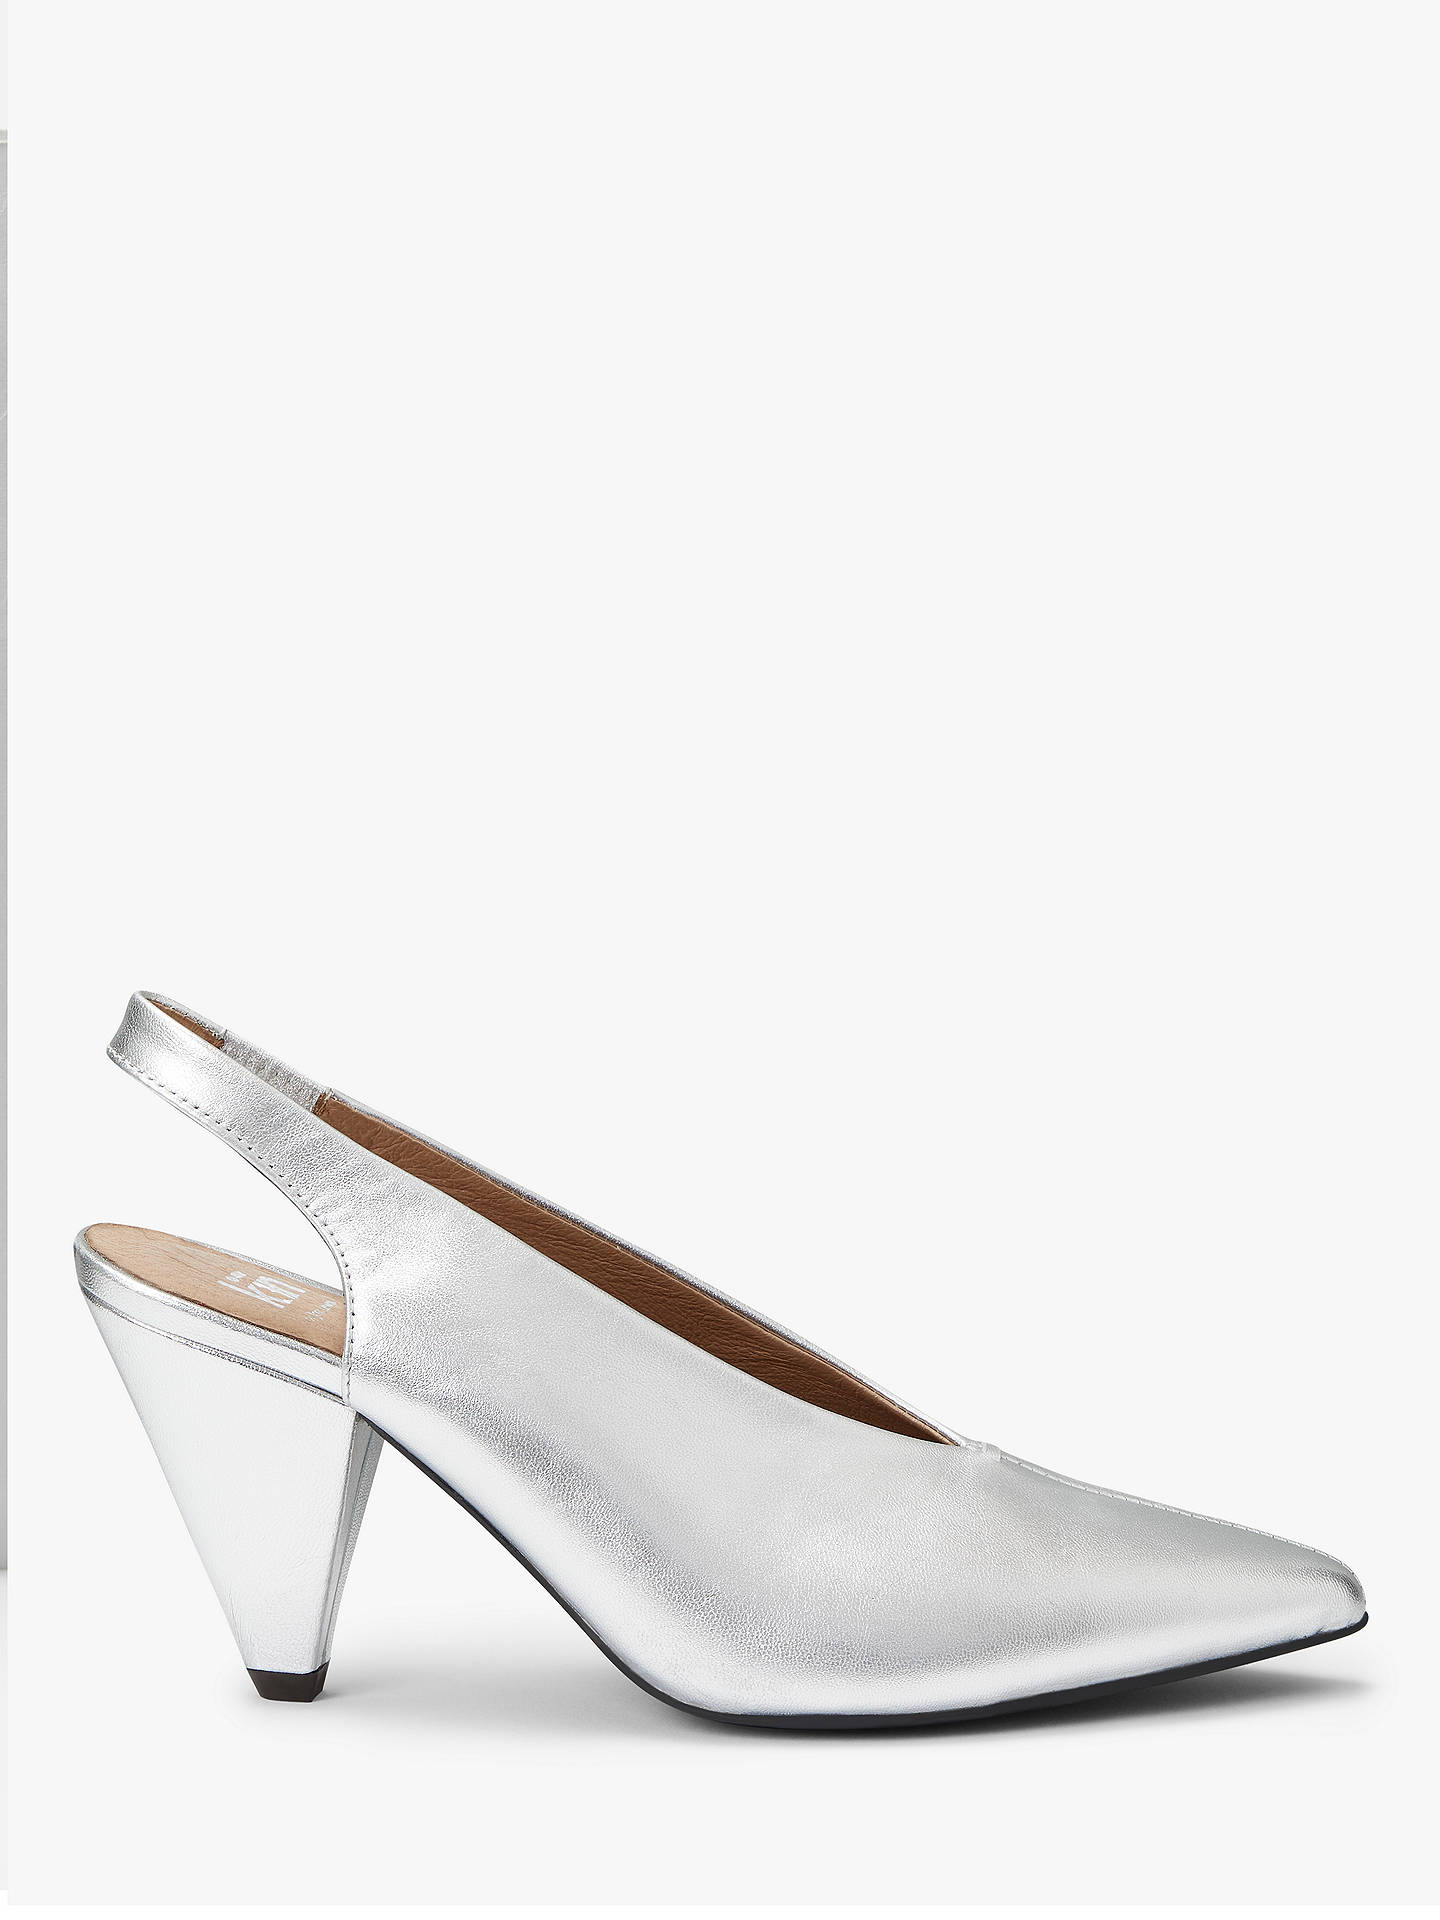 ccc4ec3eb9651 Kin Carina Cone Heel Slingback Court Shoes, Silver Leather